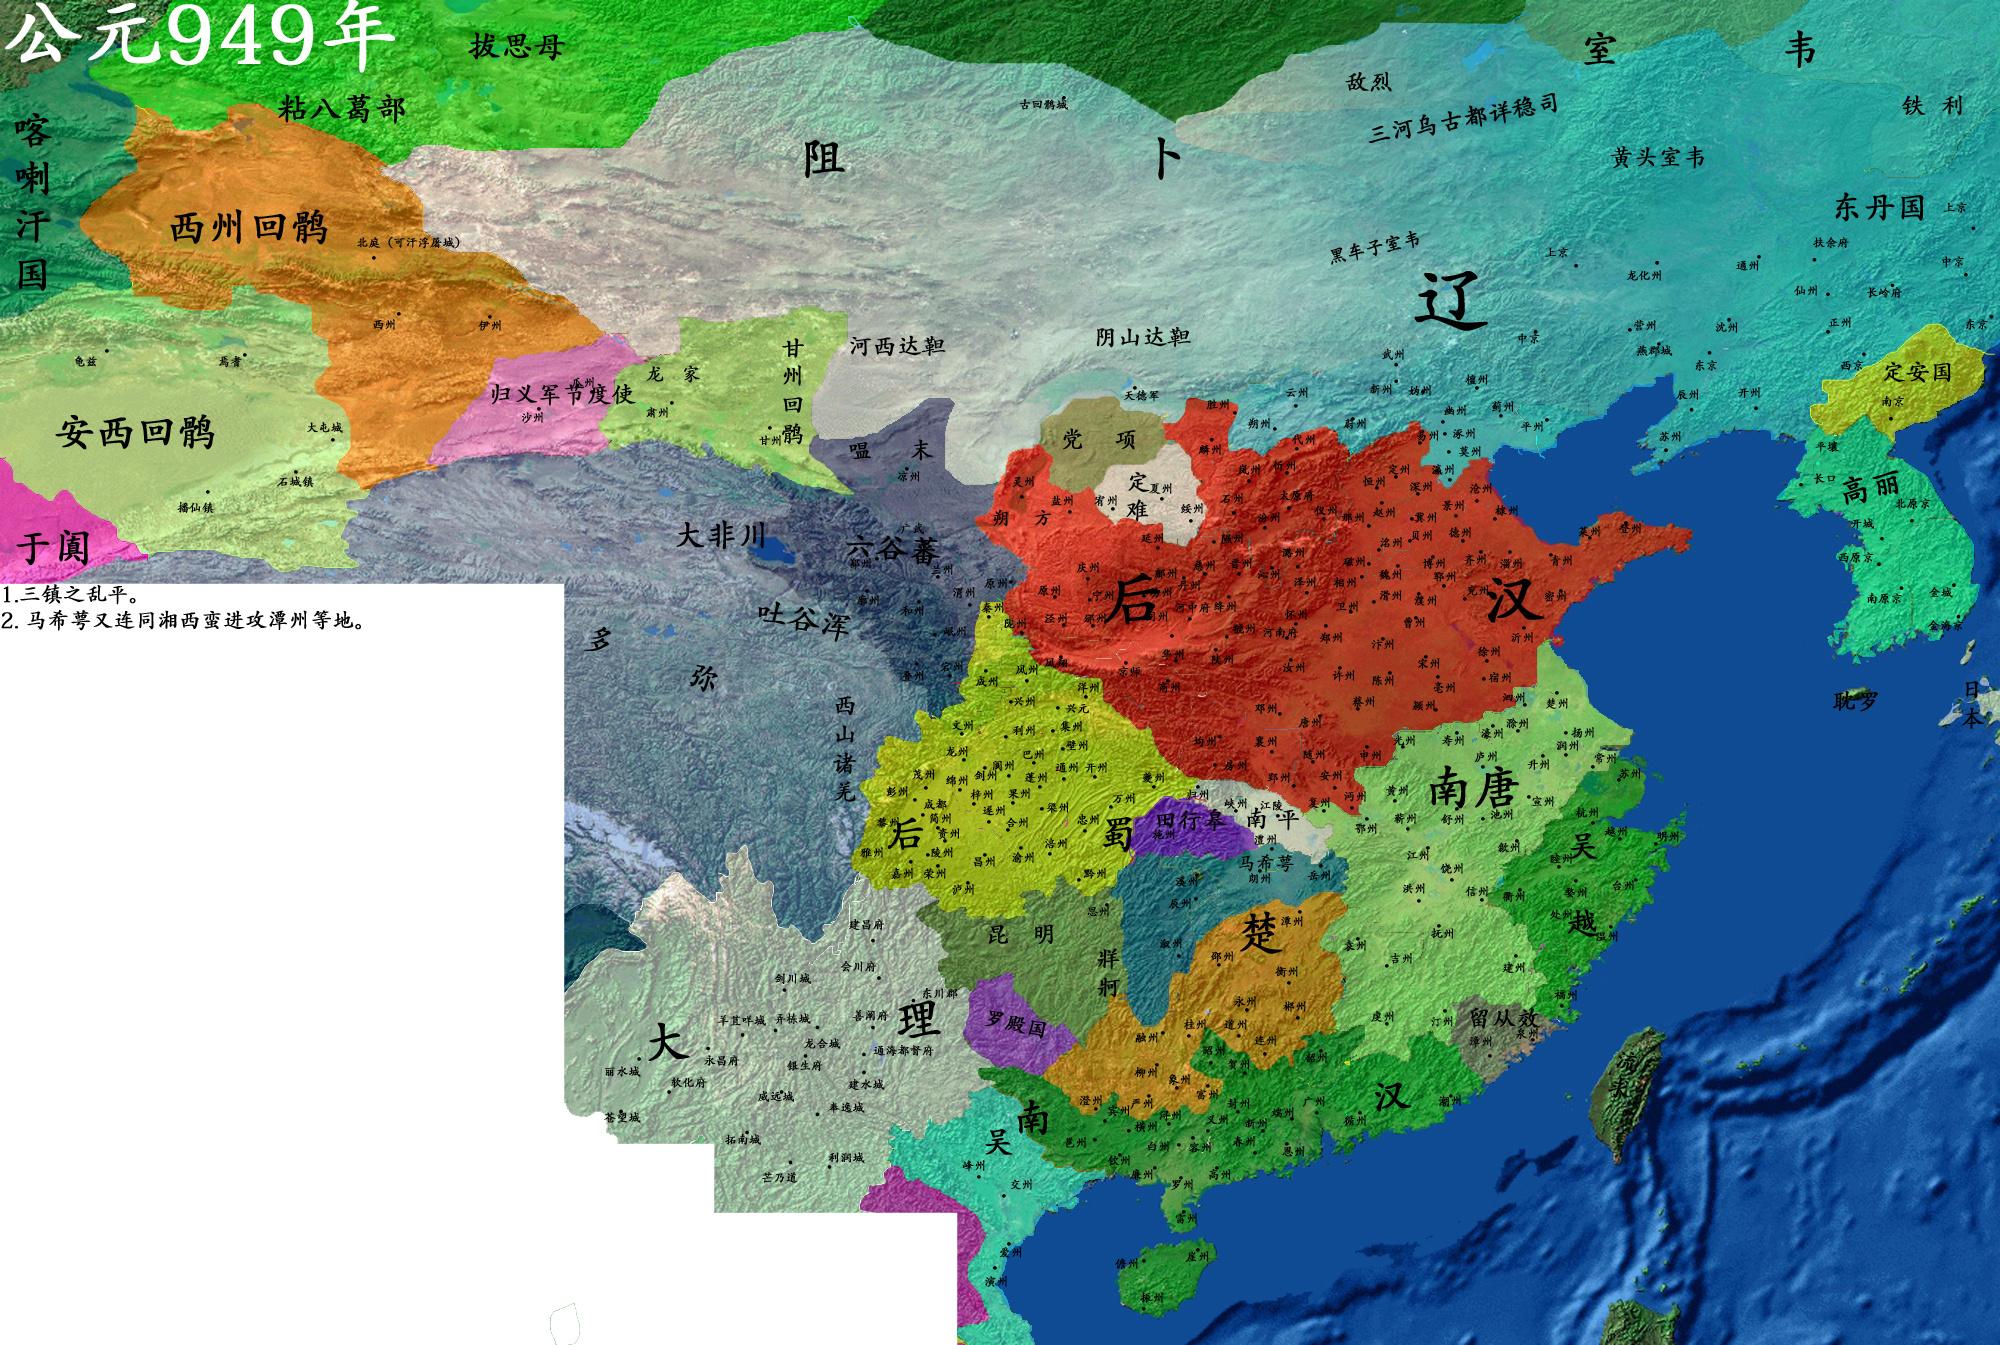 【歷史⑨課】五代十國連年地圖(6) - AcFun彈幕視頻網 - 認真你就輸啦 (?ω?)ノ- ( ゜- ゜)つロ